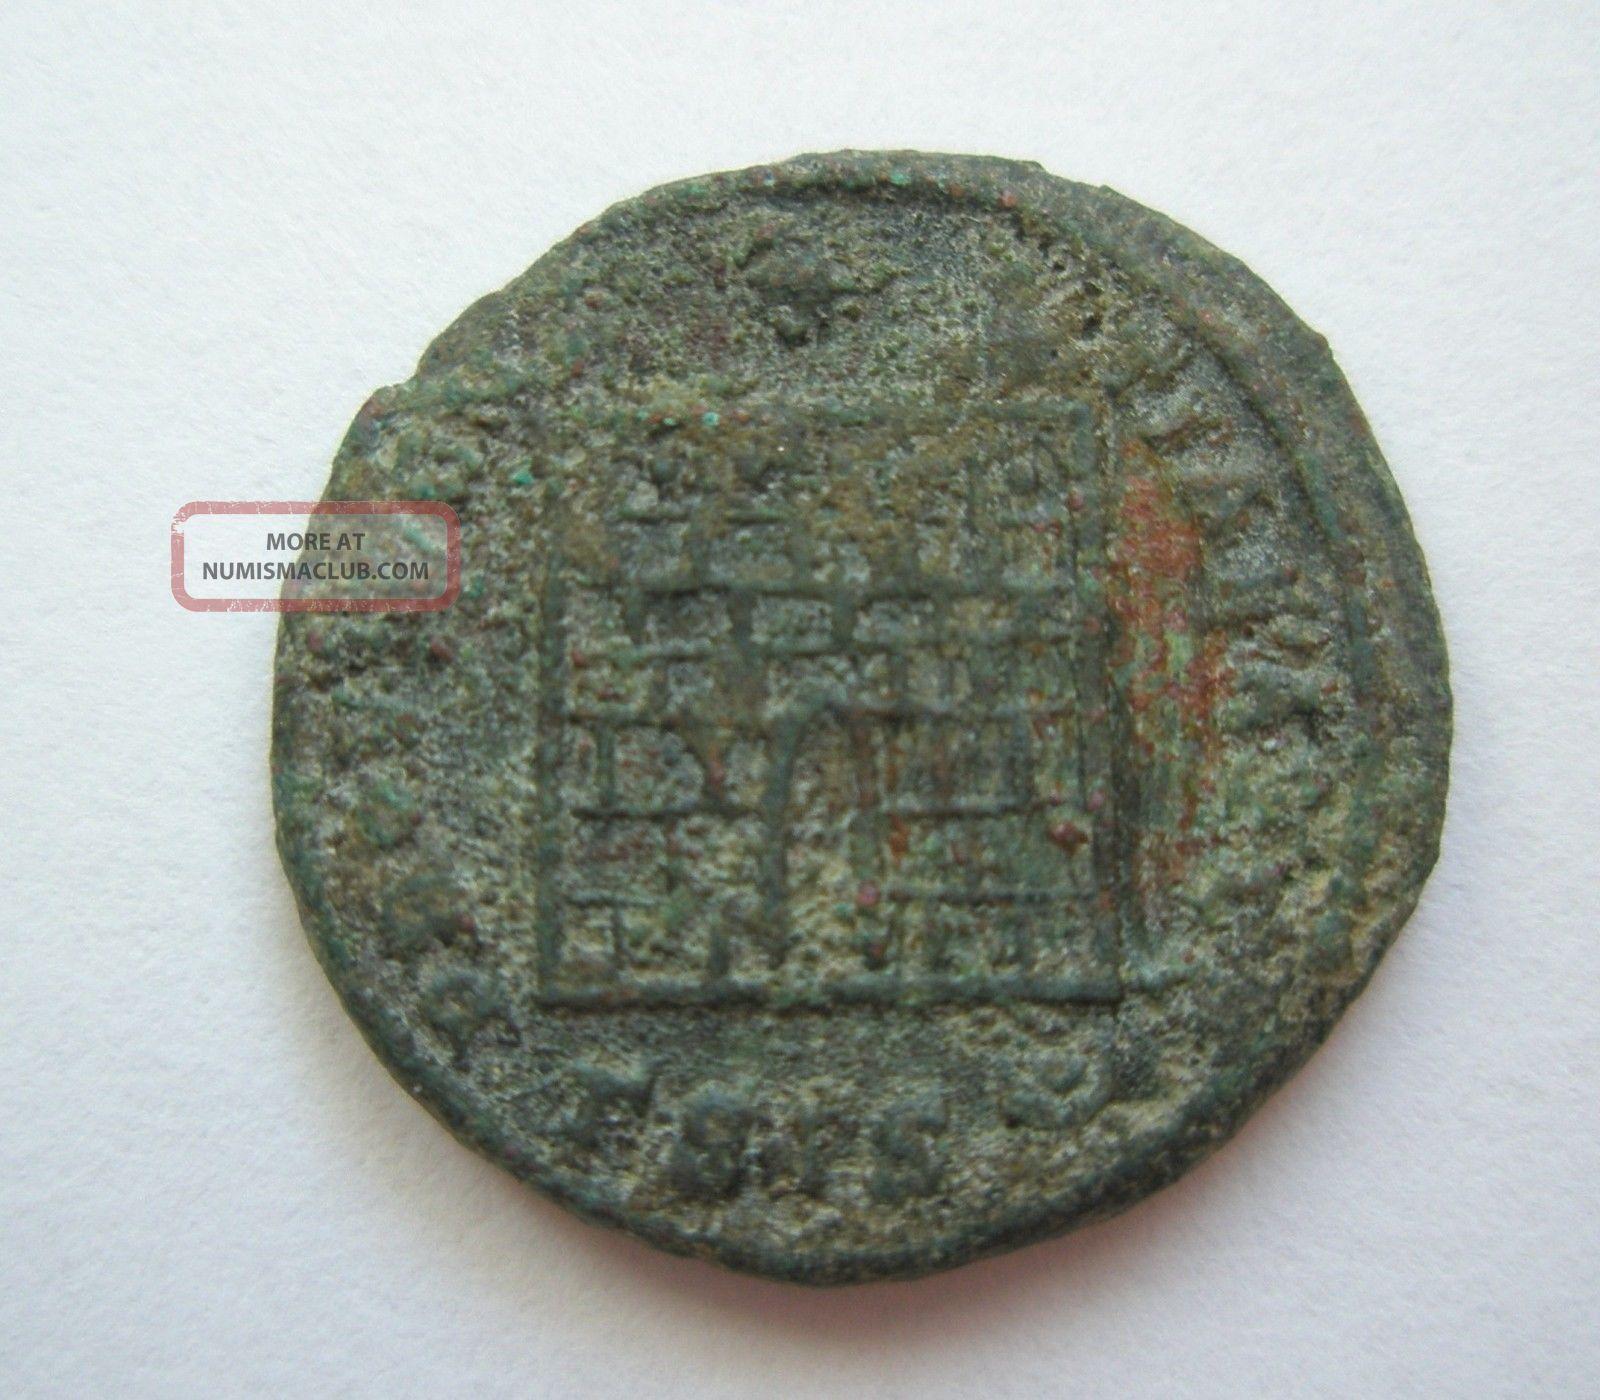 Ancient Rome Ae Nummus Follis Constantine Great Campgate Siscia Patina S58 Coins: Ancient photo